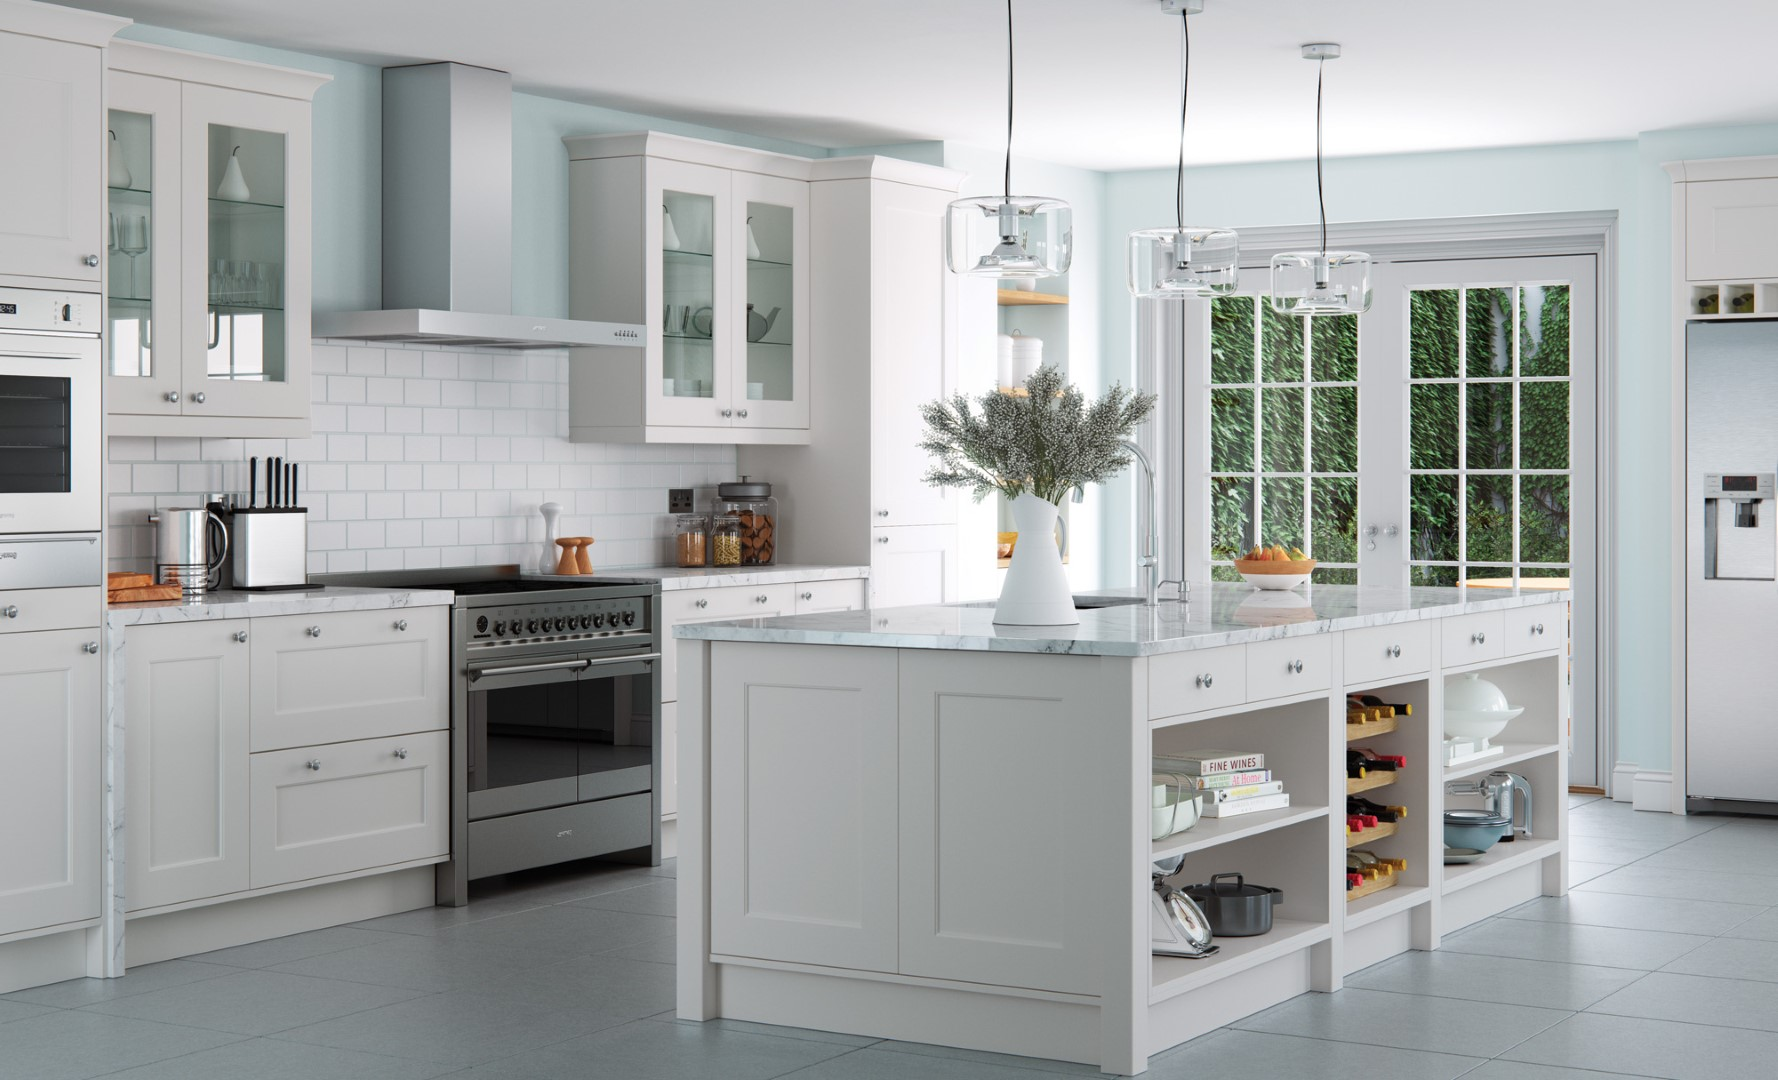 Contemporary Modern Kitchen - Florence Painted Porcelain Kitchen - Kitchen Design - Alan Kelly Kitchens - Waterford